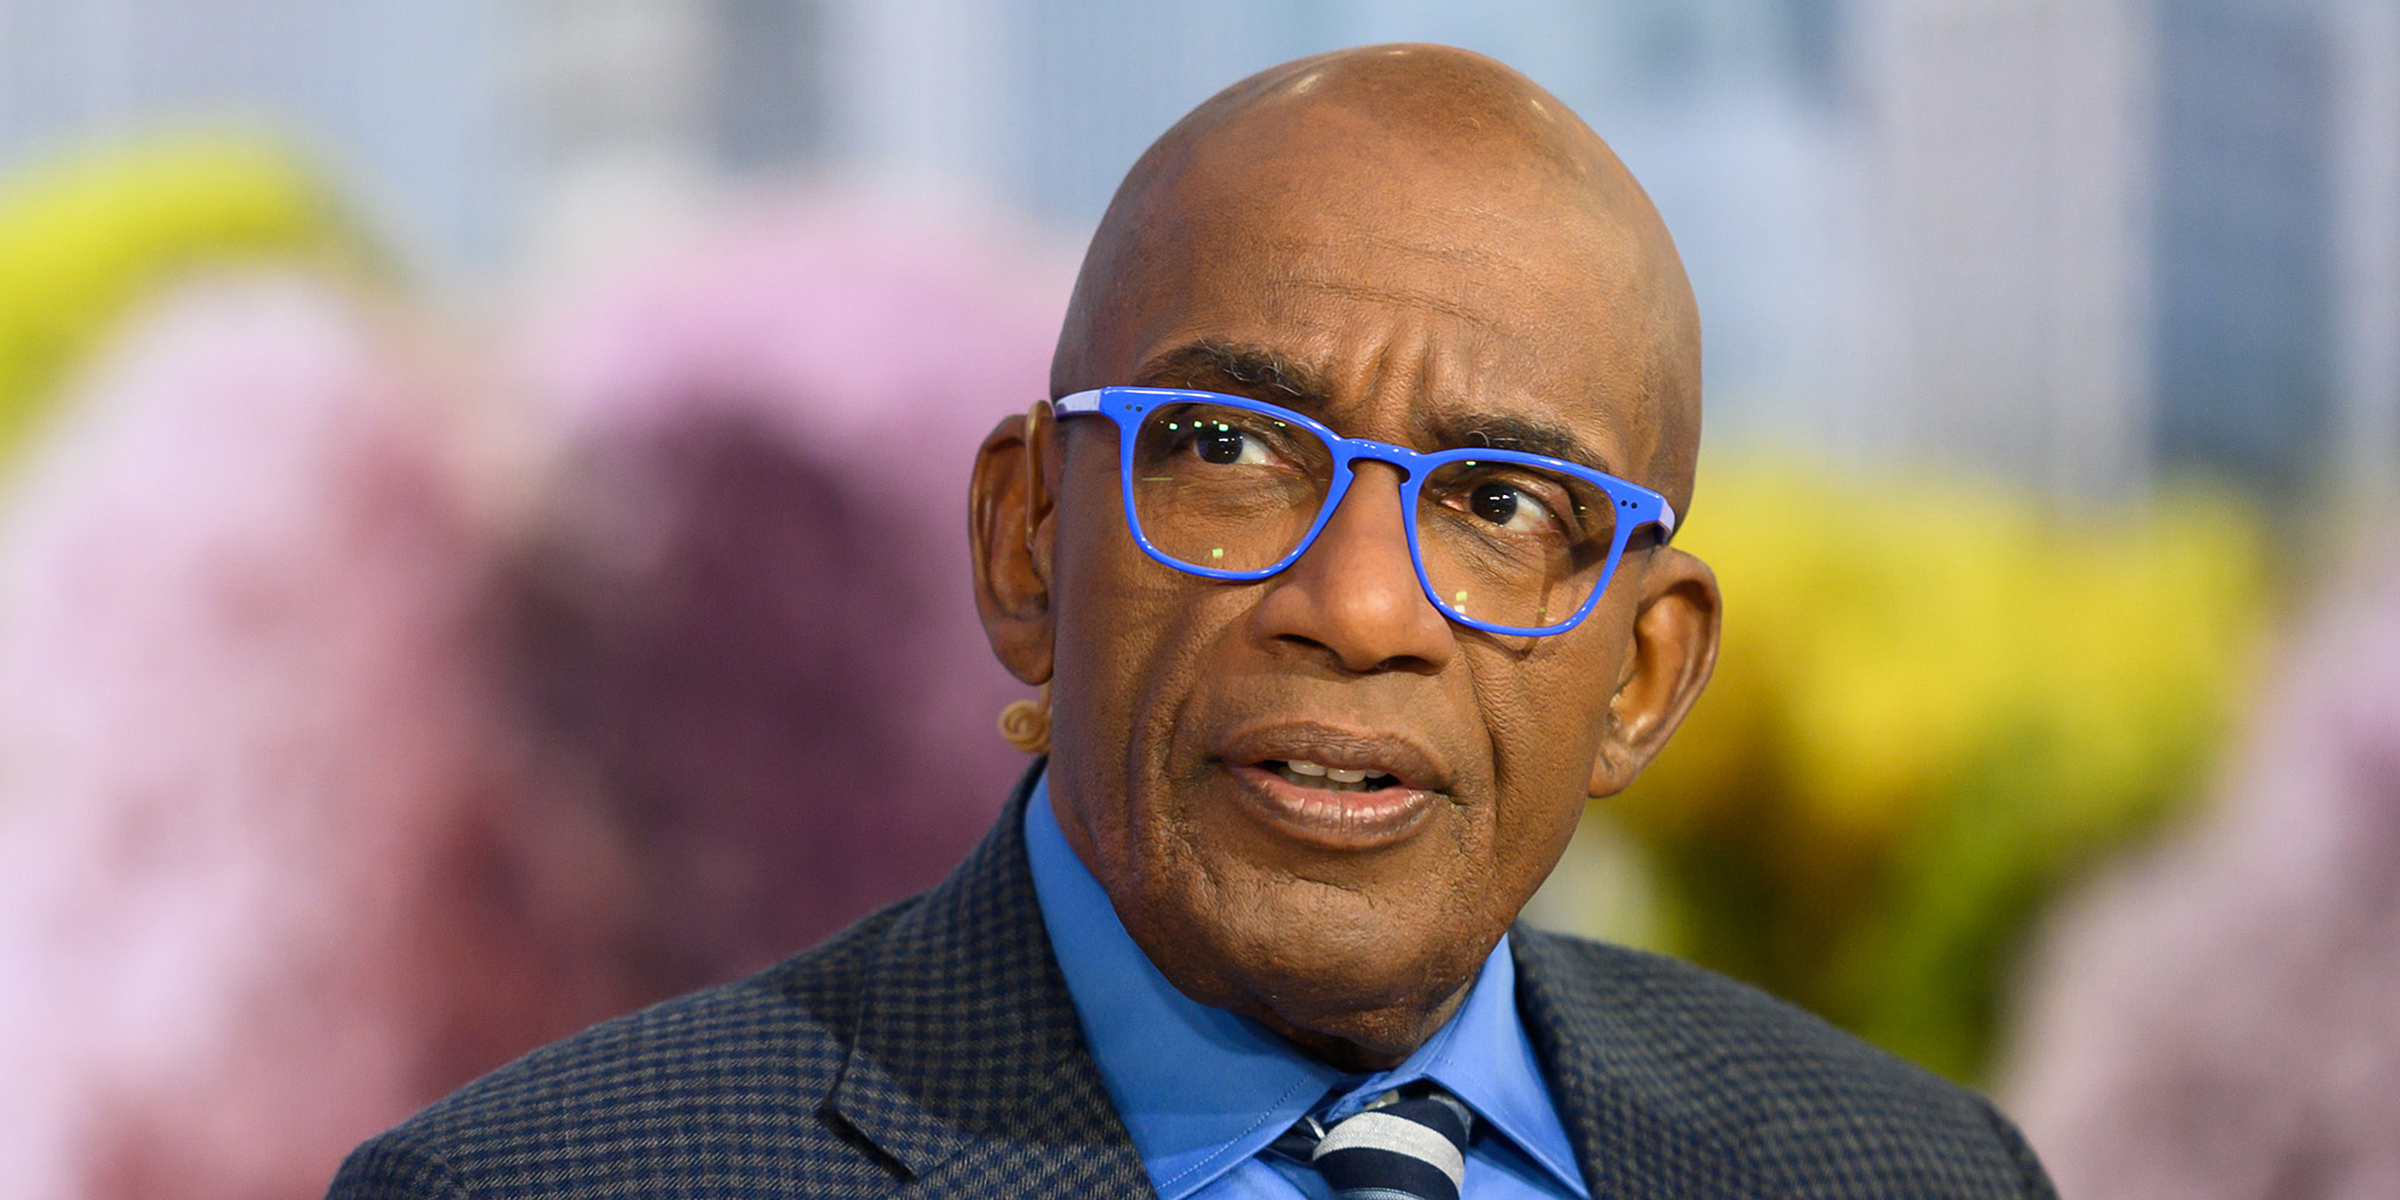 Al Roker Reveals Prostate Cancer News